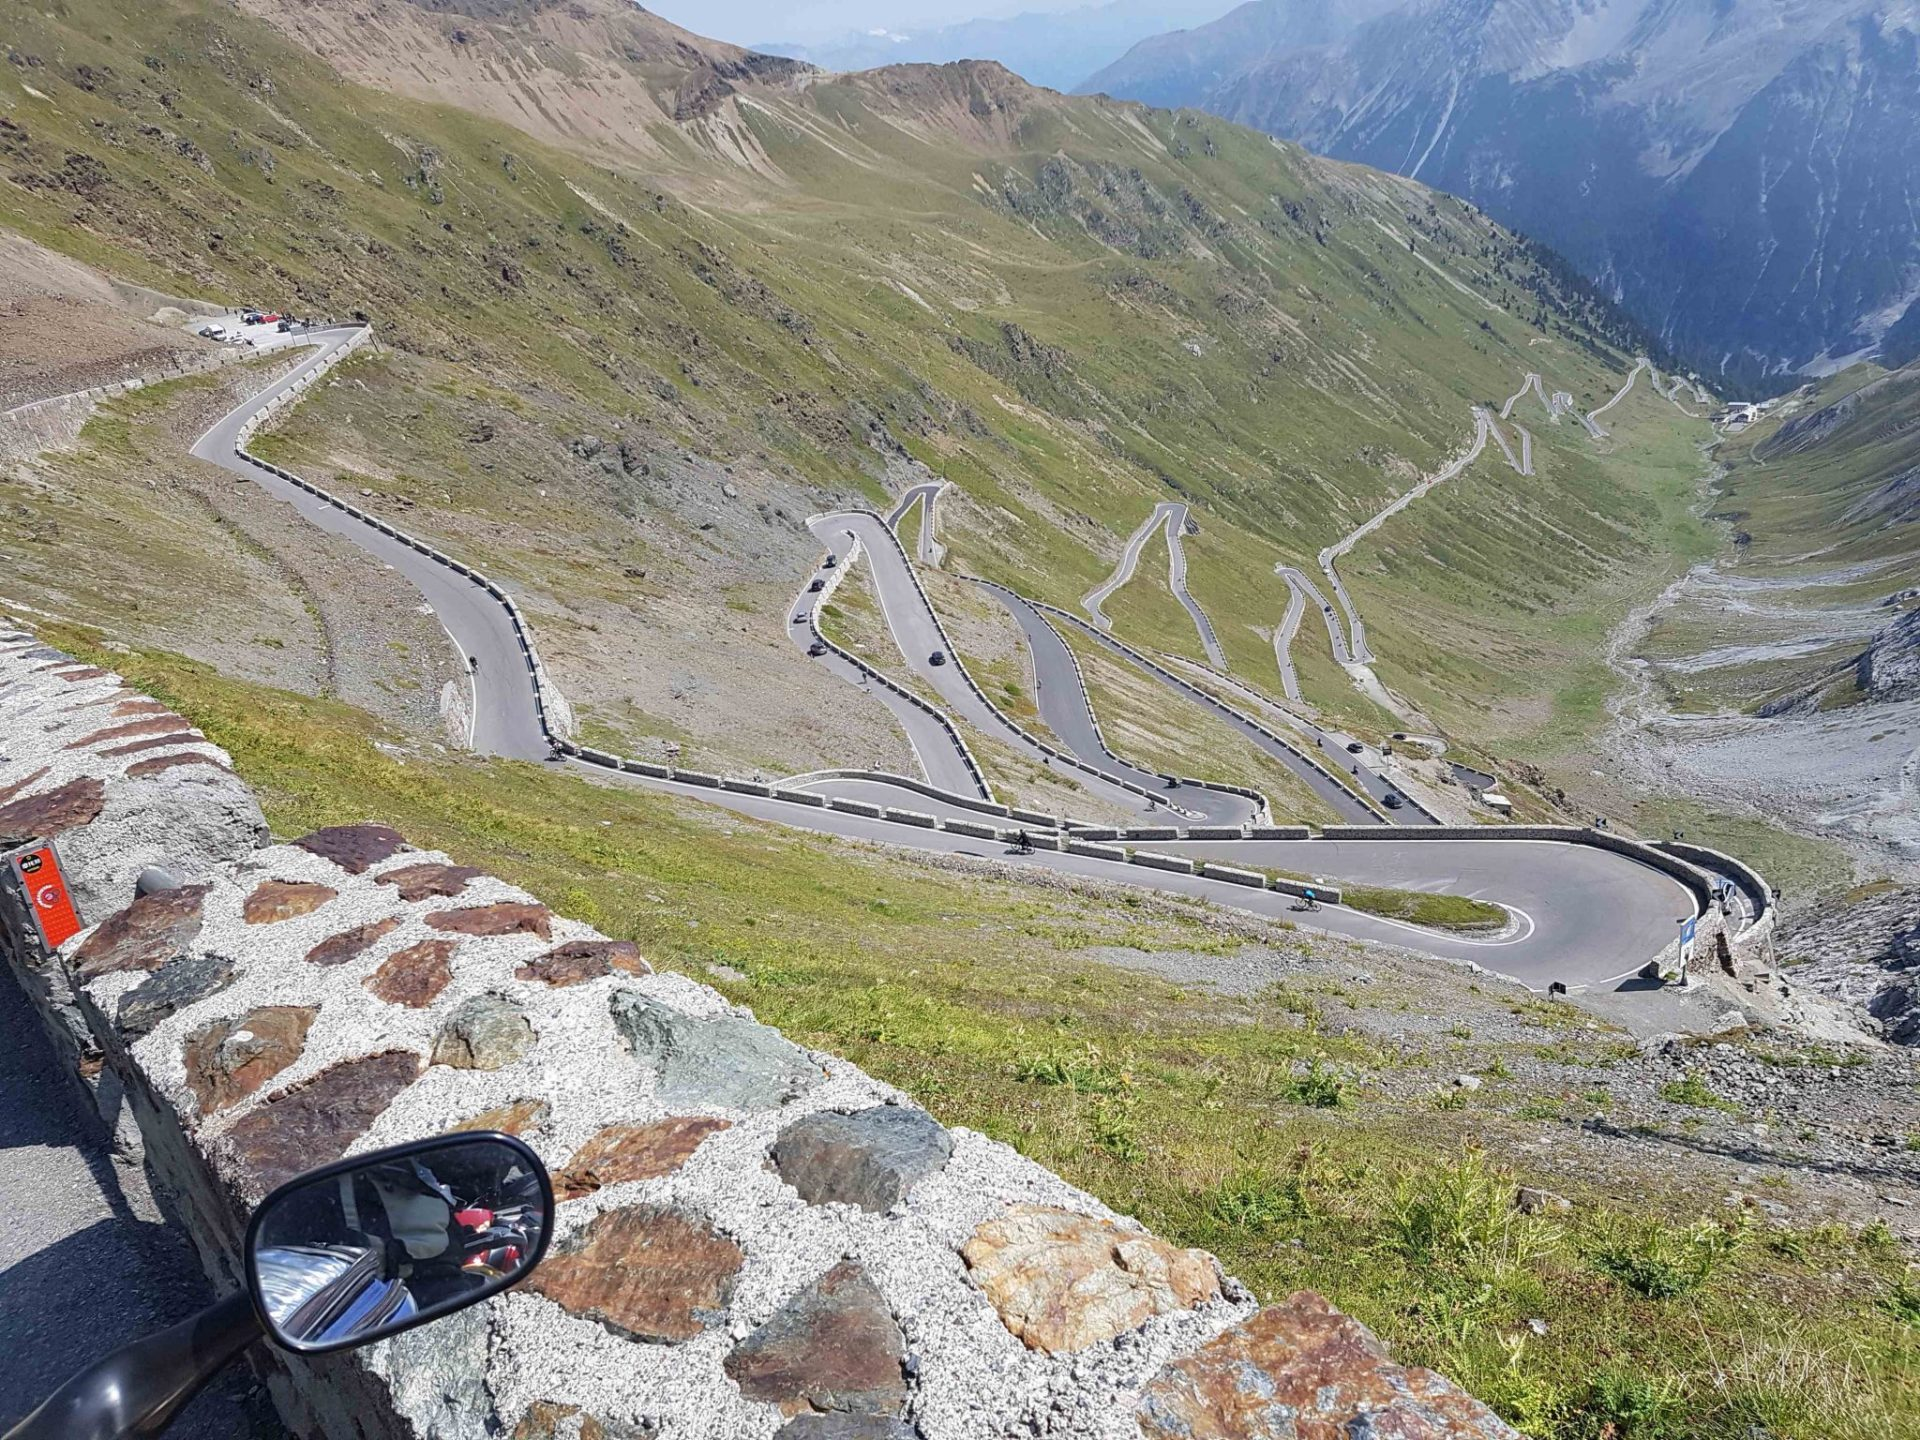 dolomites and alps passes